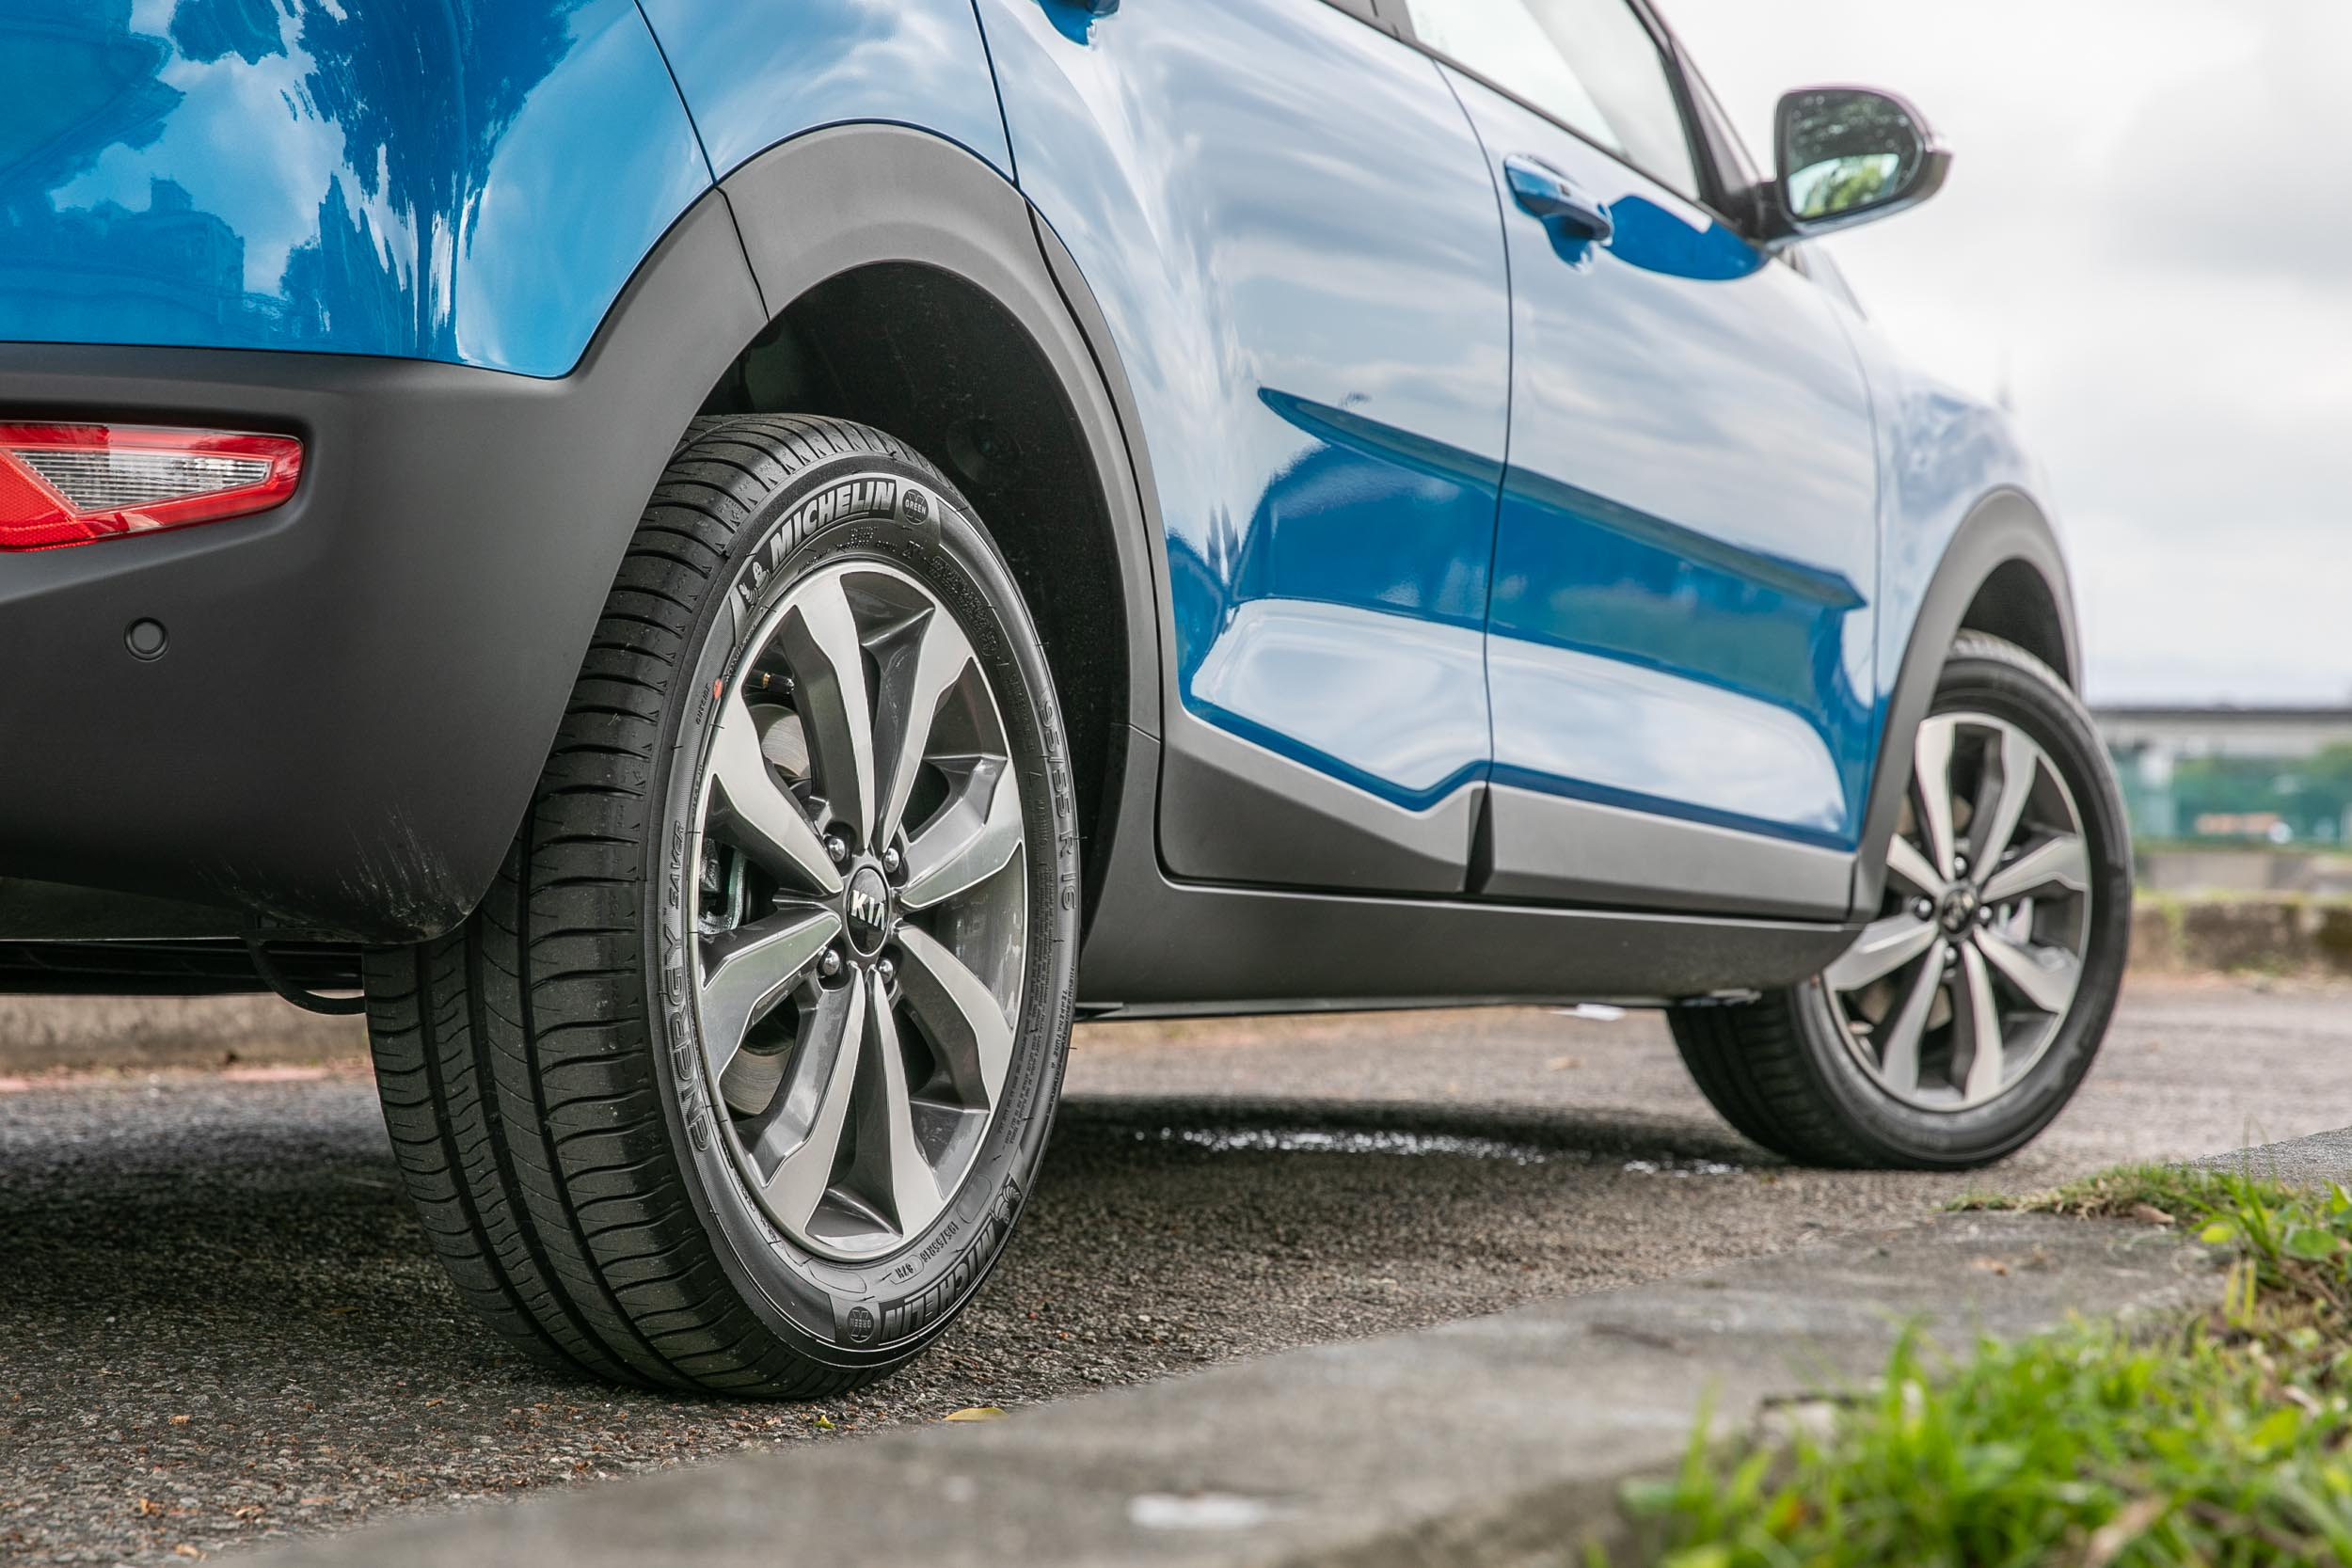 Stonic 1.0T智慧油電驚豔版專屬的 16 吋輪圈,配備 195/55R16 規格輪胎。